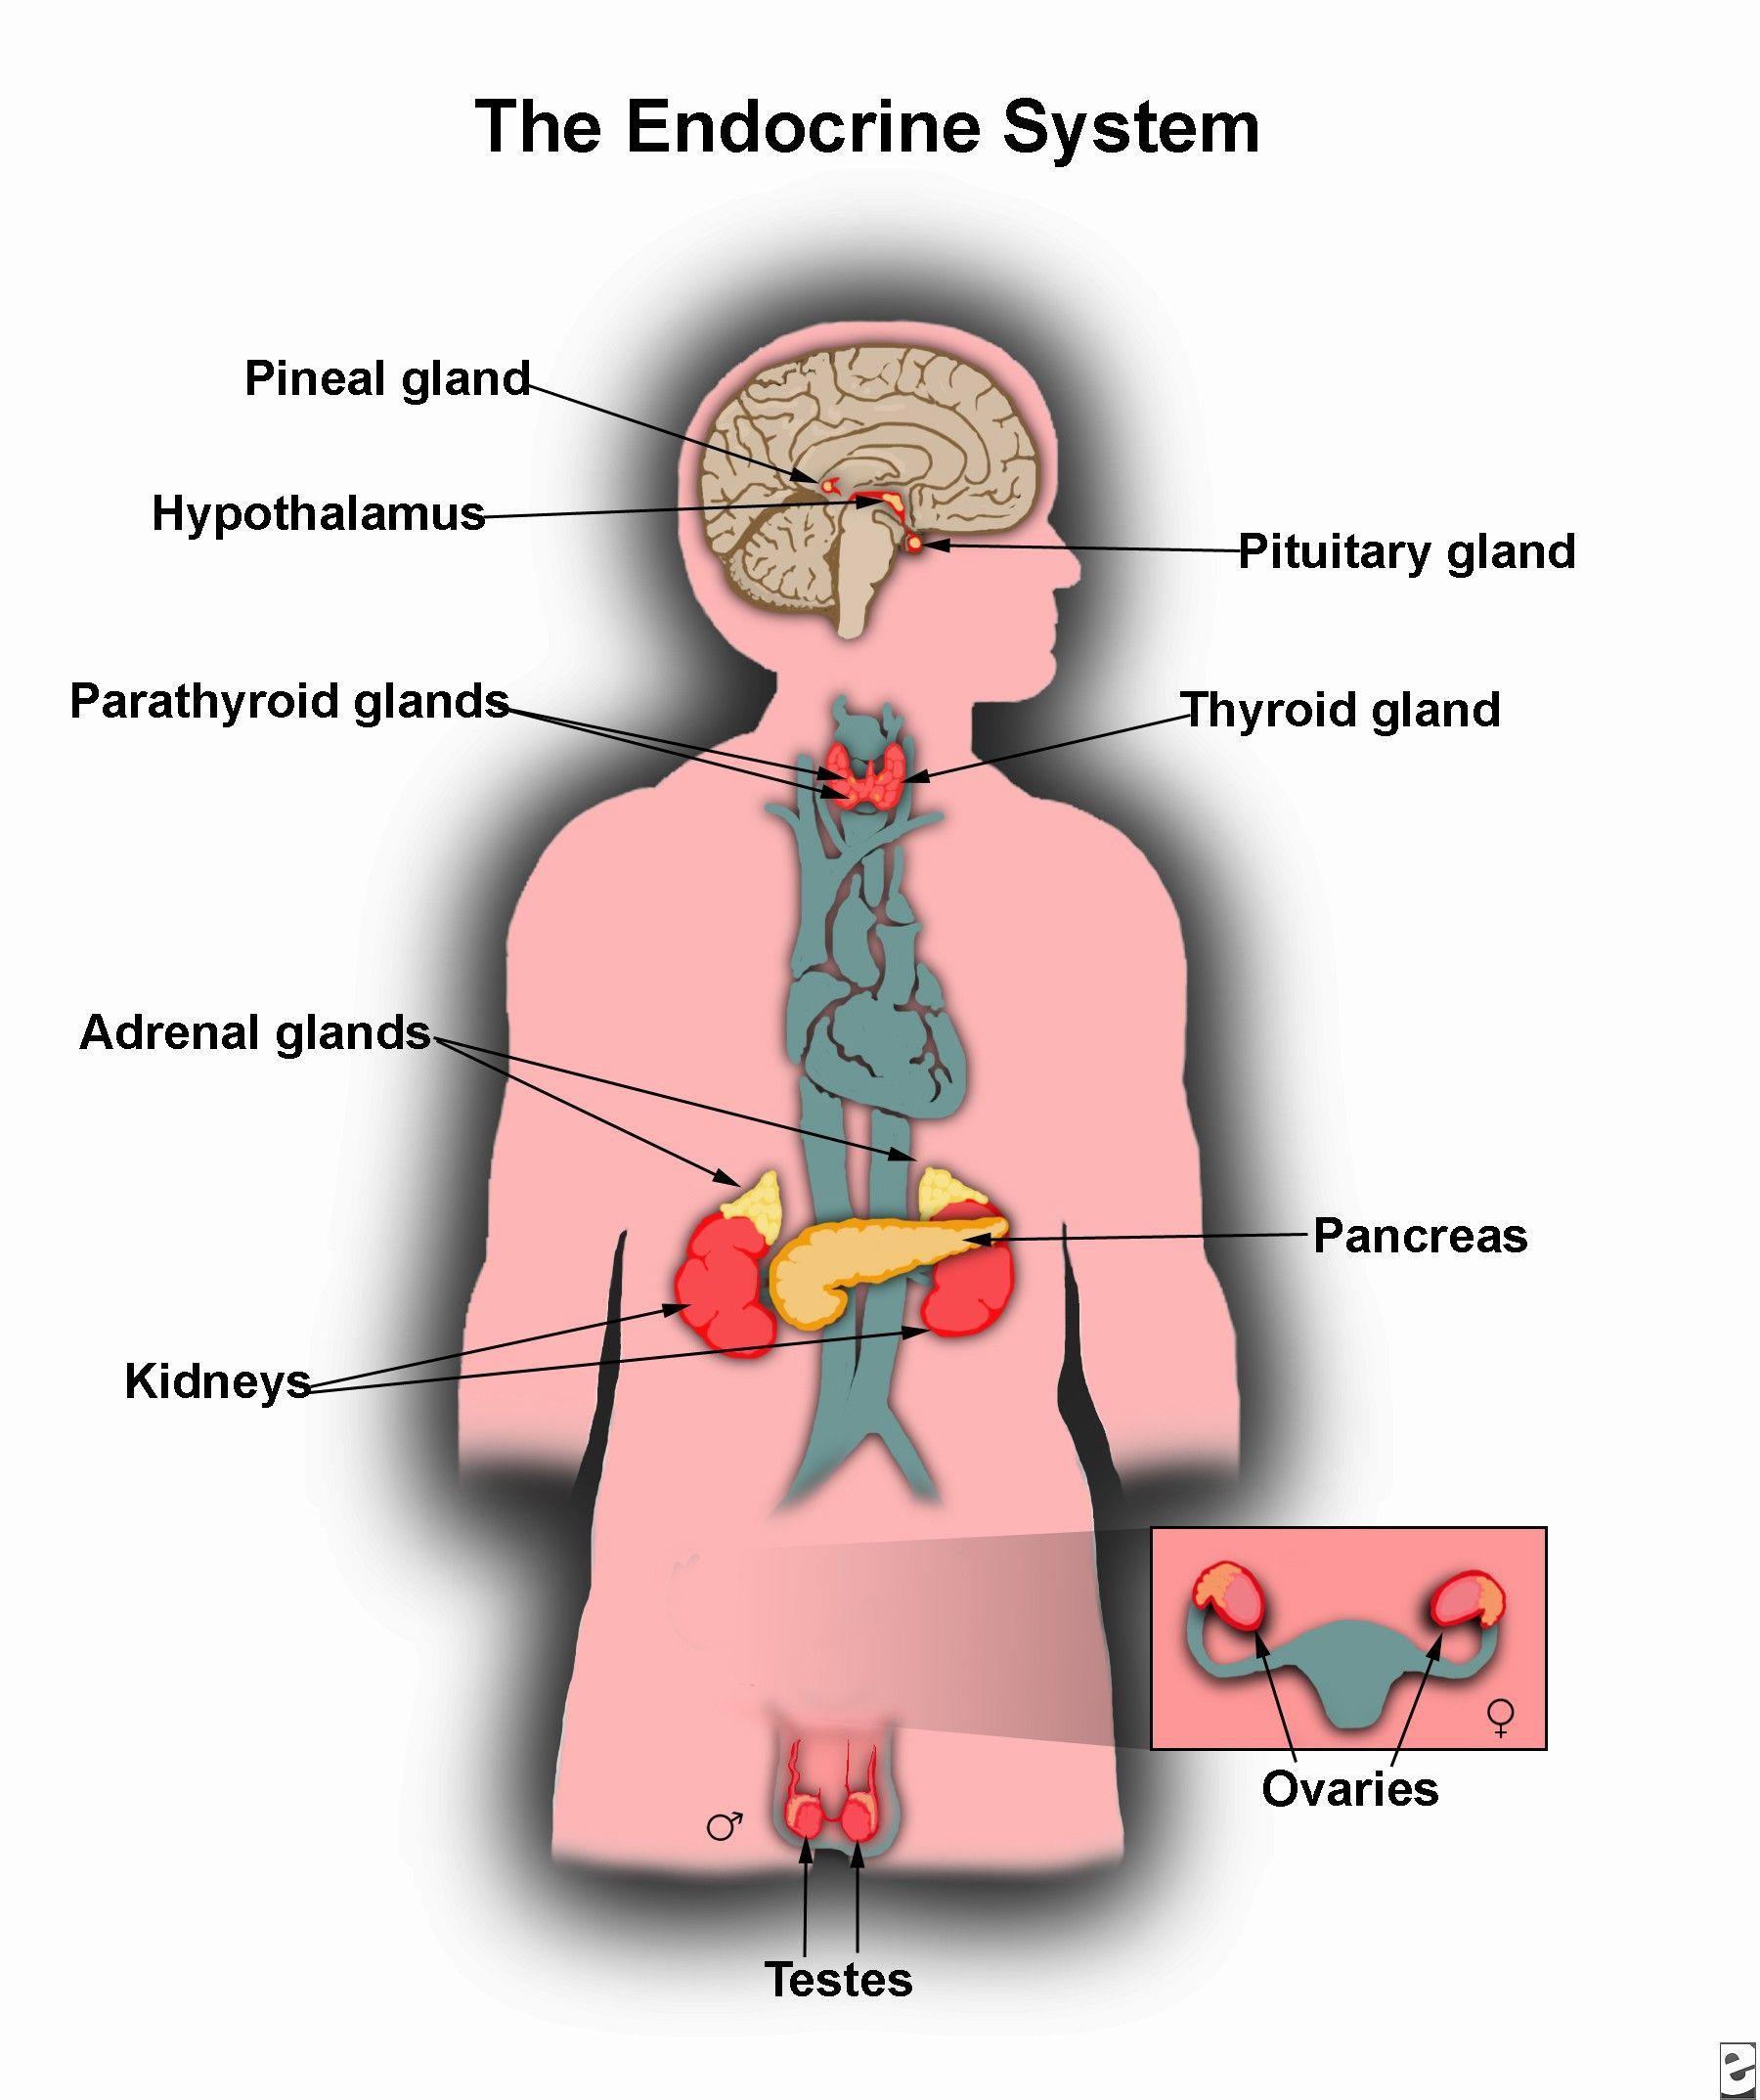 endocrine system the o 39 jays and paper on pinterest : endocrine diagram - findchart.co